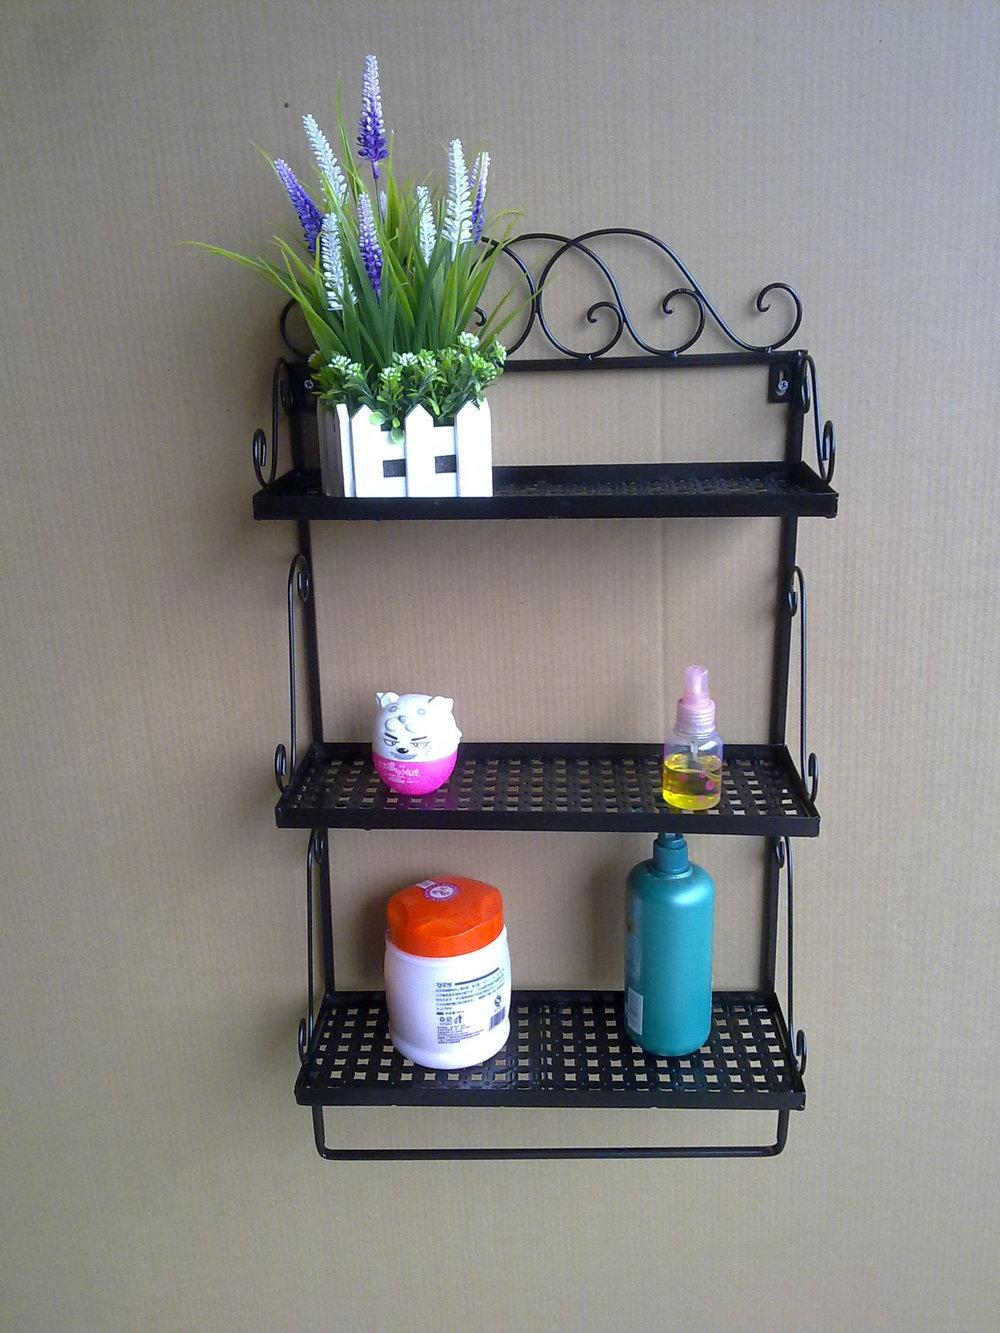 2014 wrought iron bathroom shelves towel rack bathroom - Accessories for bathroom shelves ...